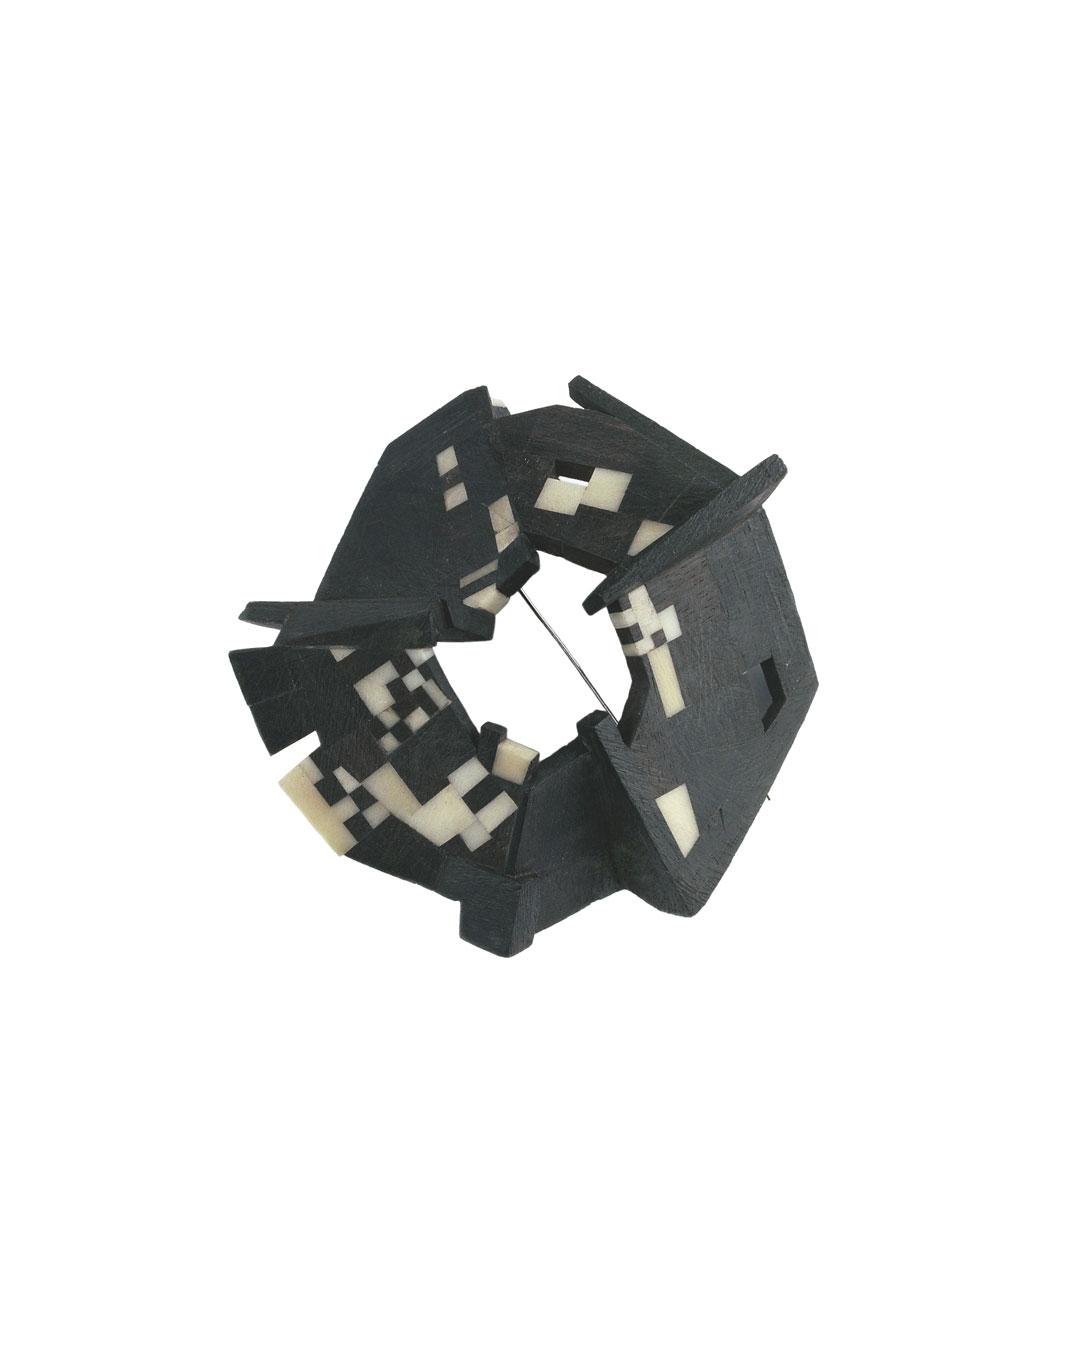 Ann Schmalwasser, Spirale (Spiral), 2008, brooch; ebony, tagua nut, 90 x 90 x 40 mm, €1650